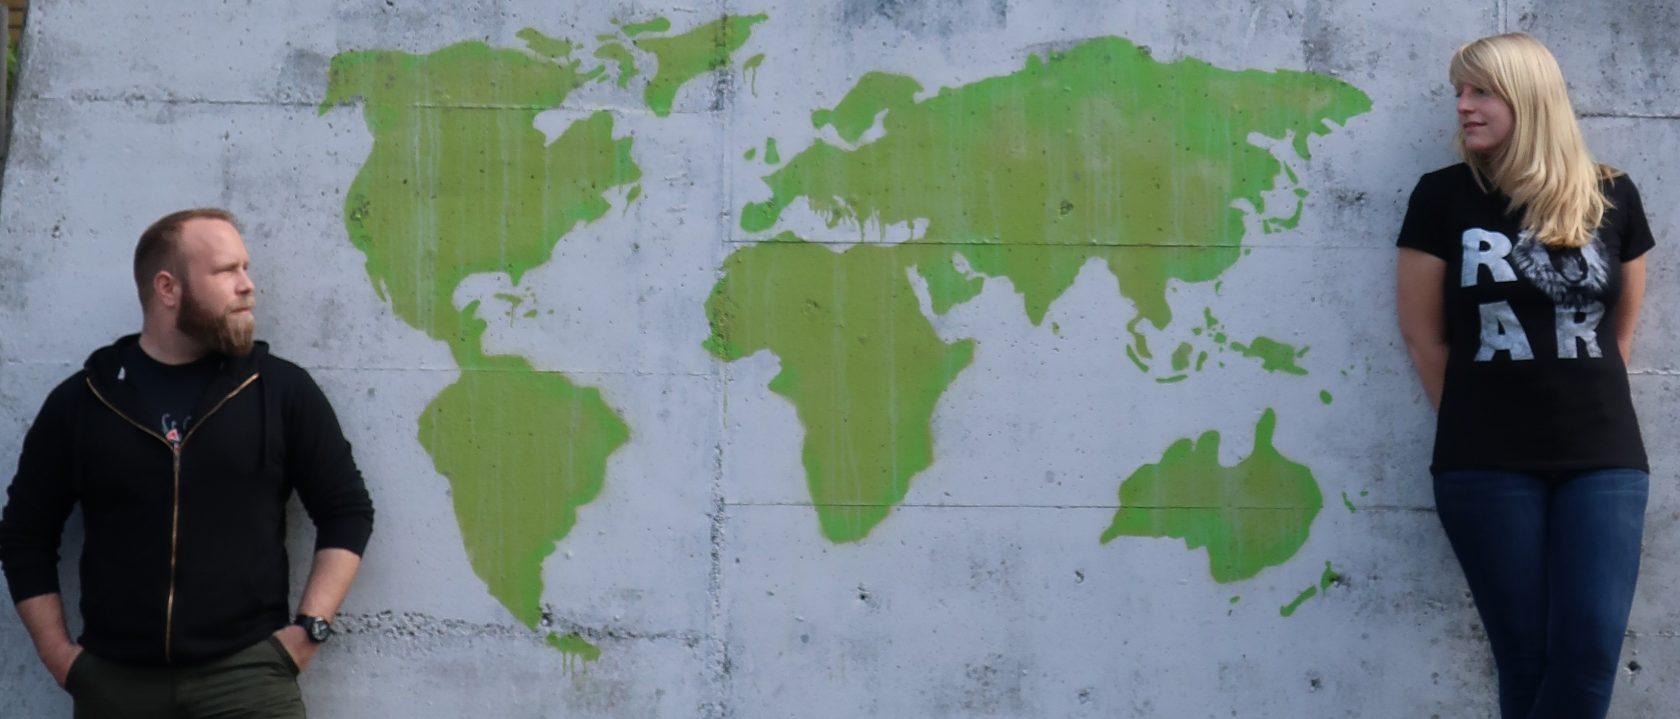 Die Weltreise